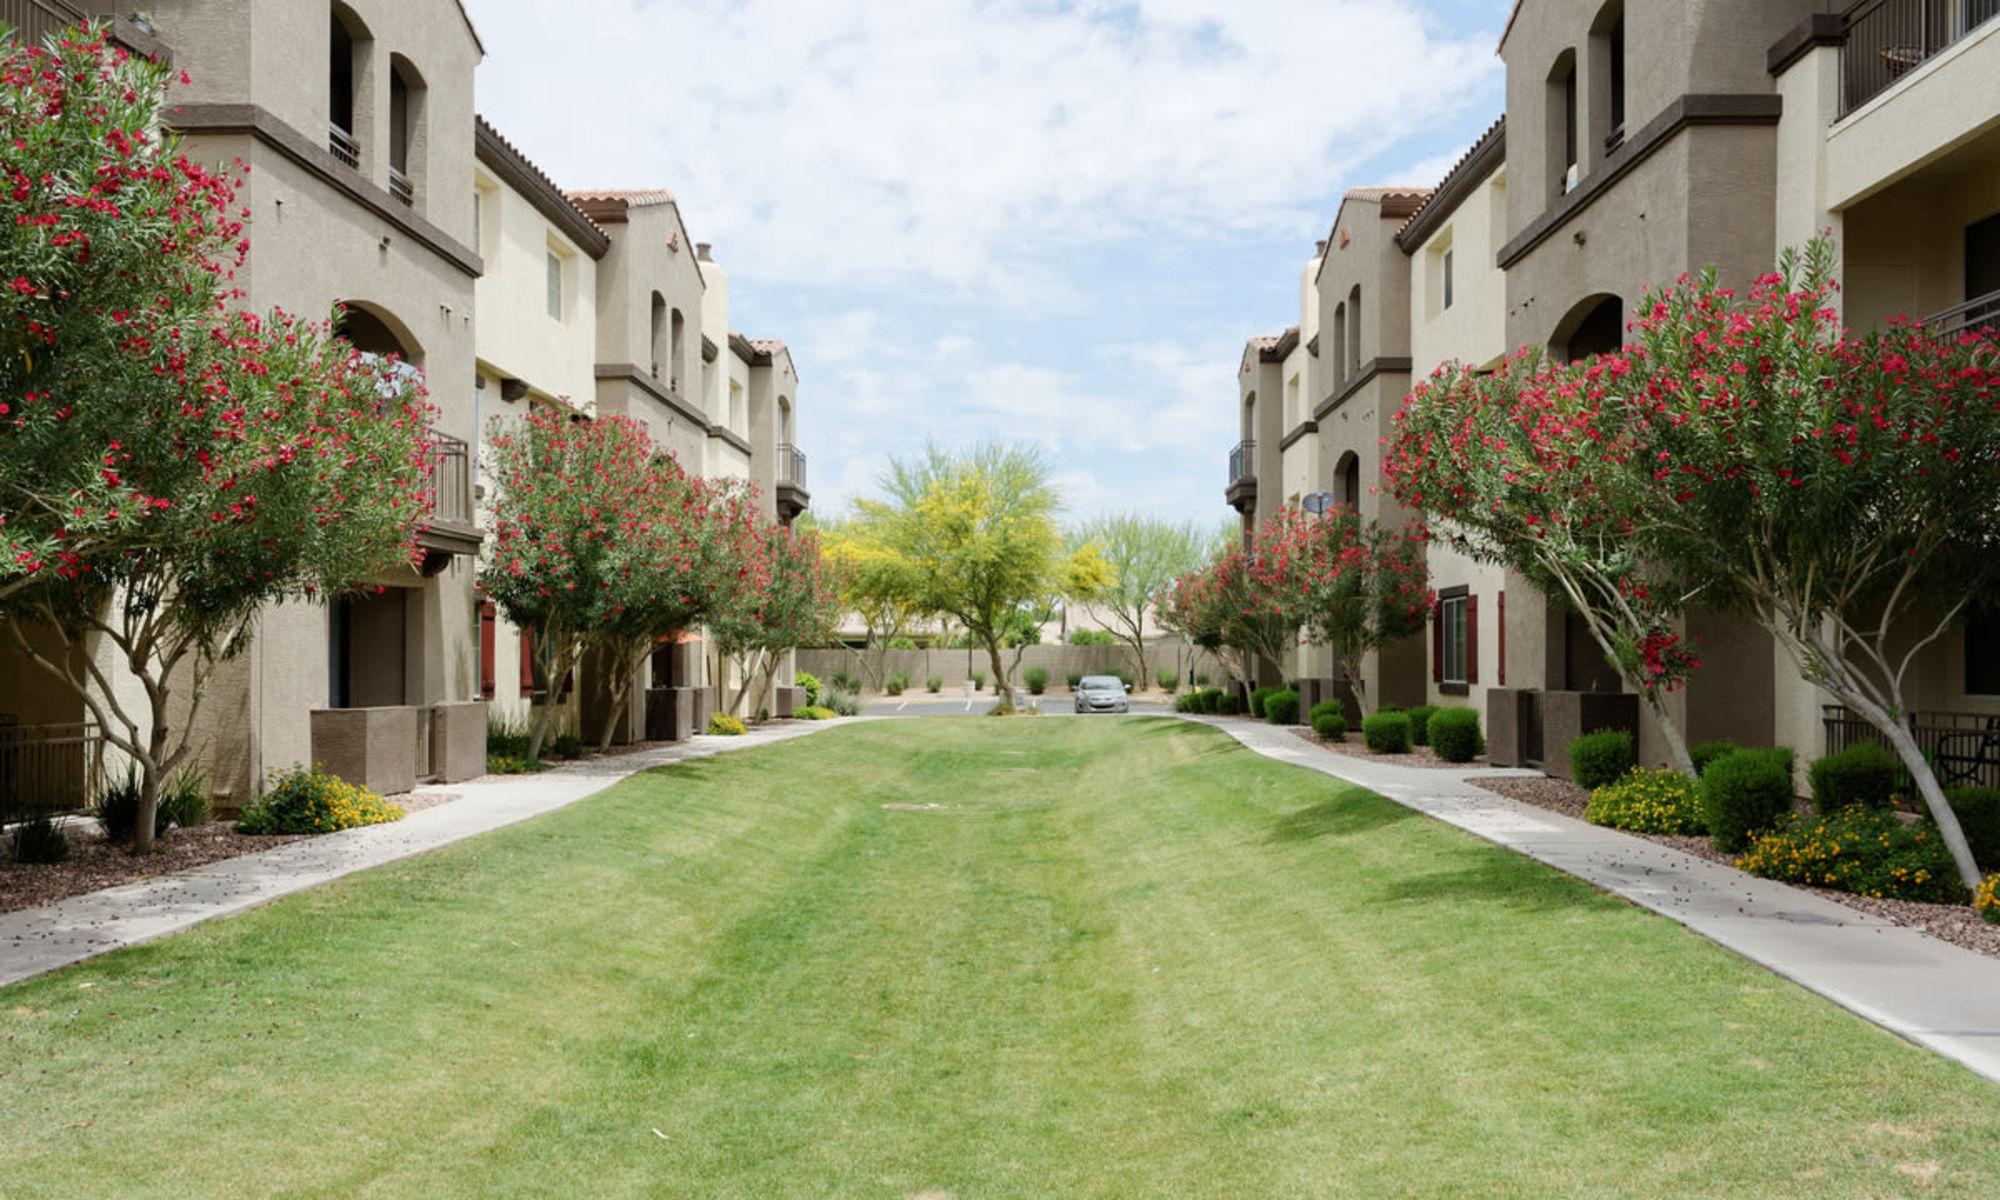 Apartments at Waterford at Peoria in Peoria, Arizona